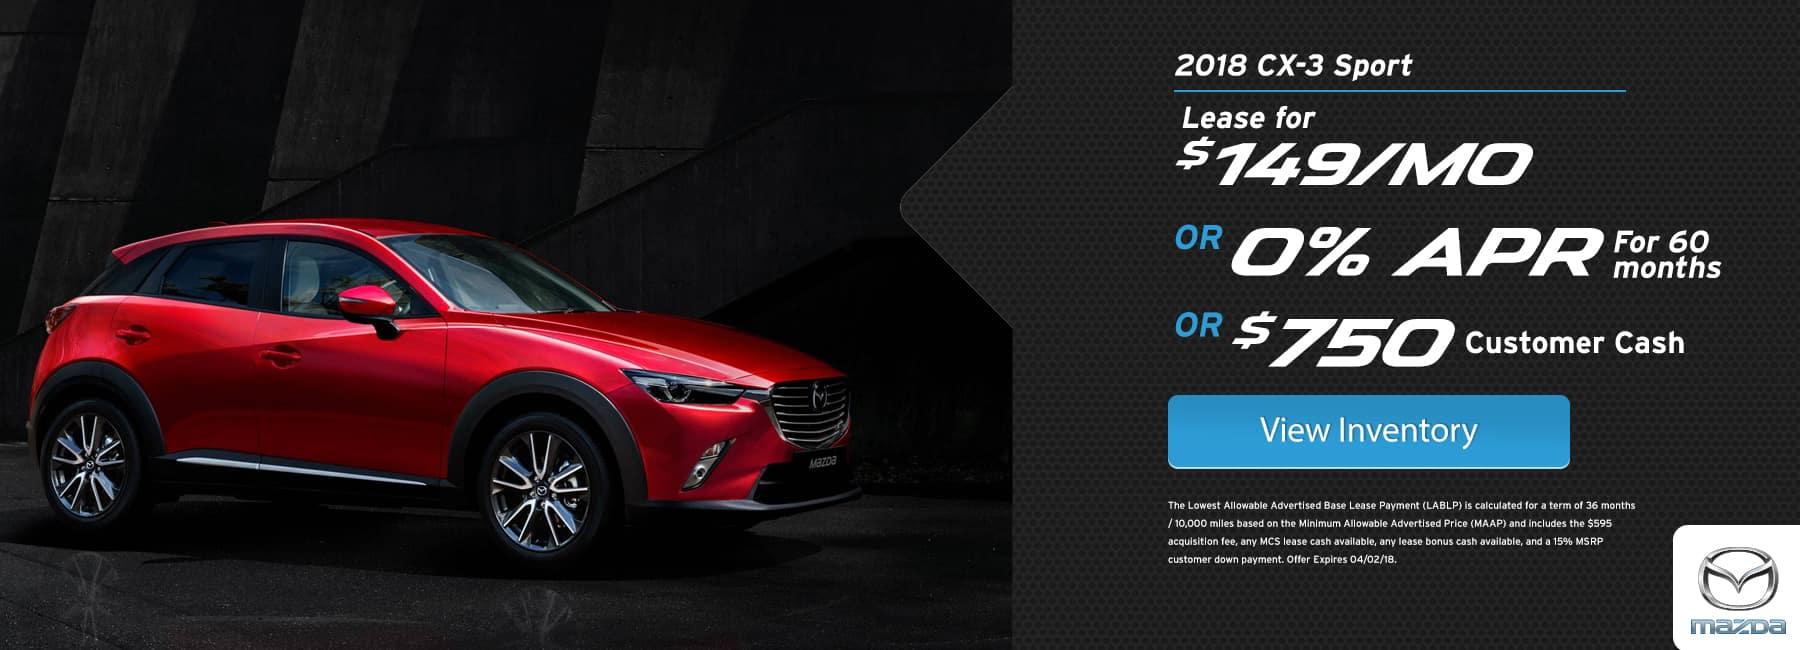 CX3 March Offer BIggers Mazda